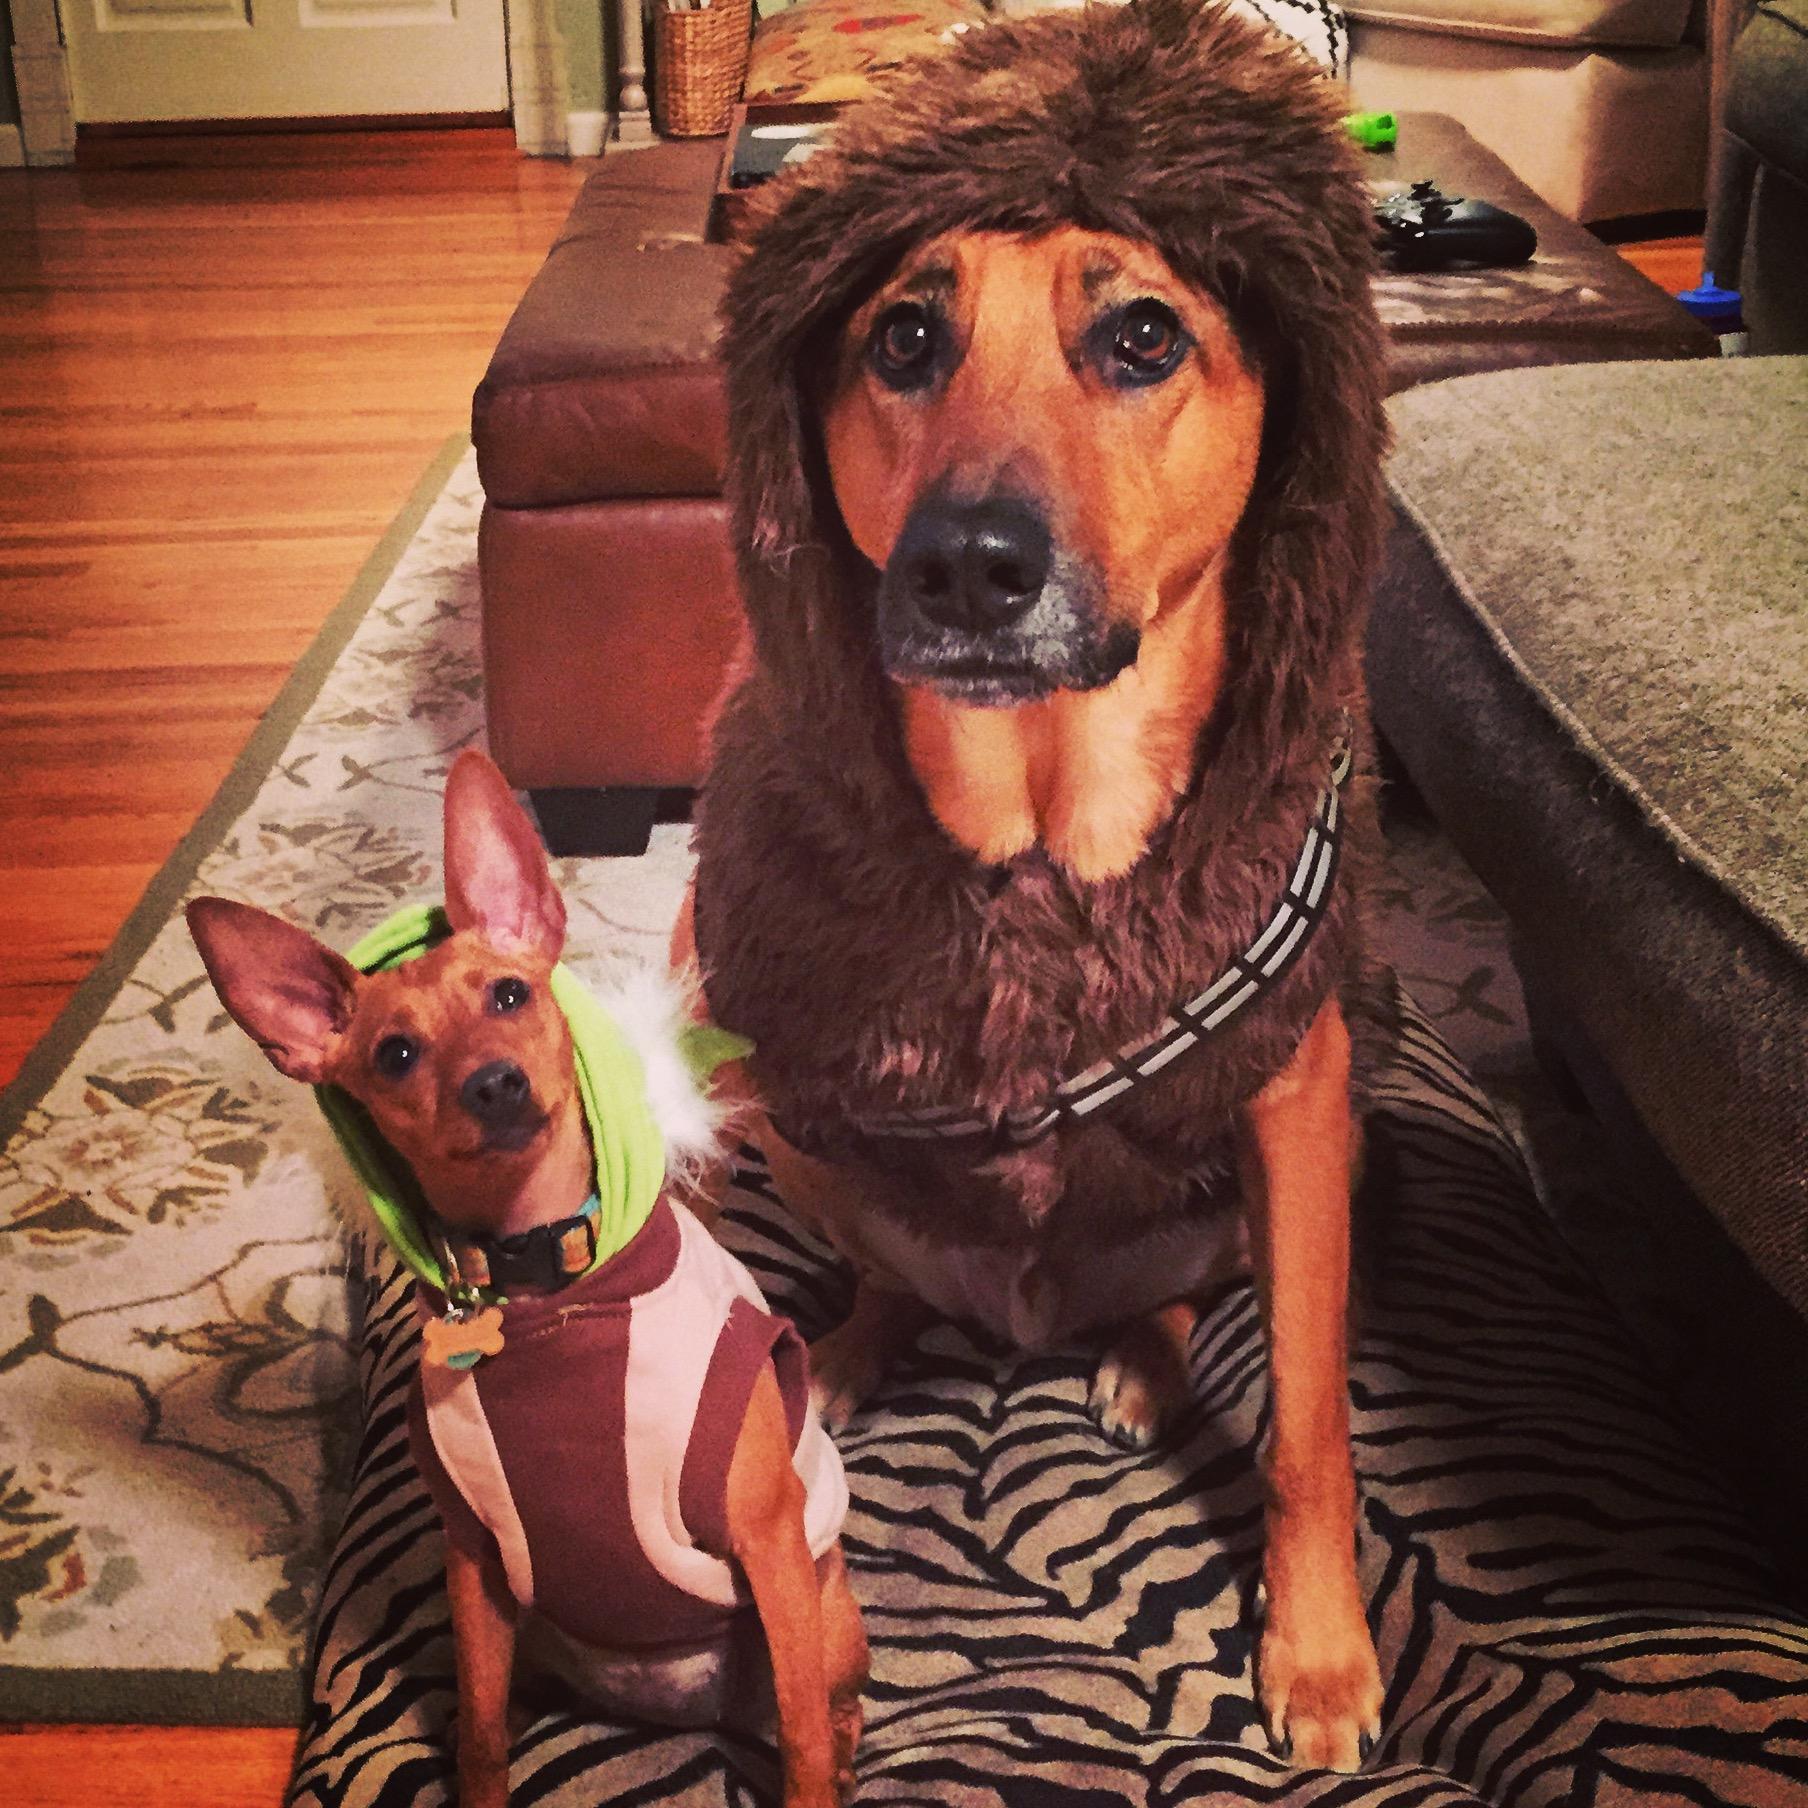 Star Wars Halloween costumes!